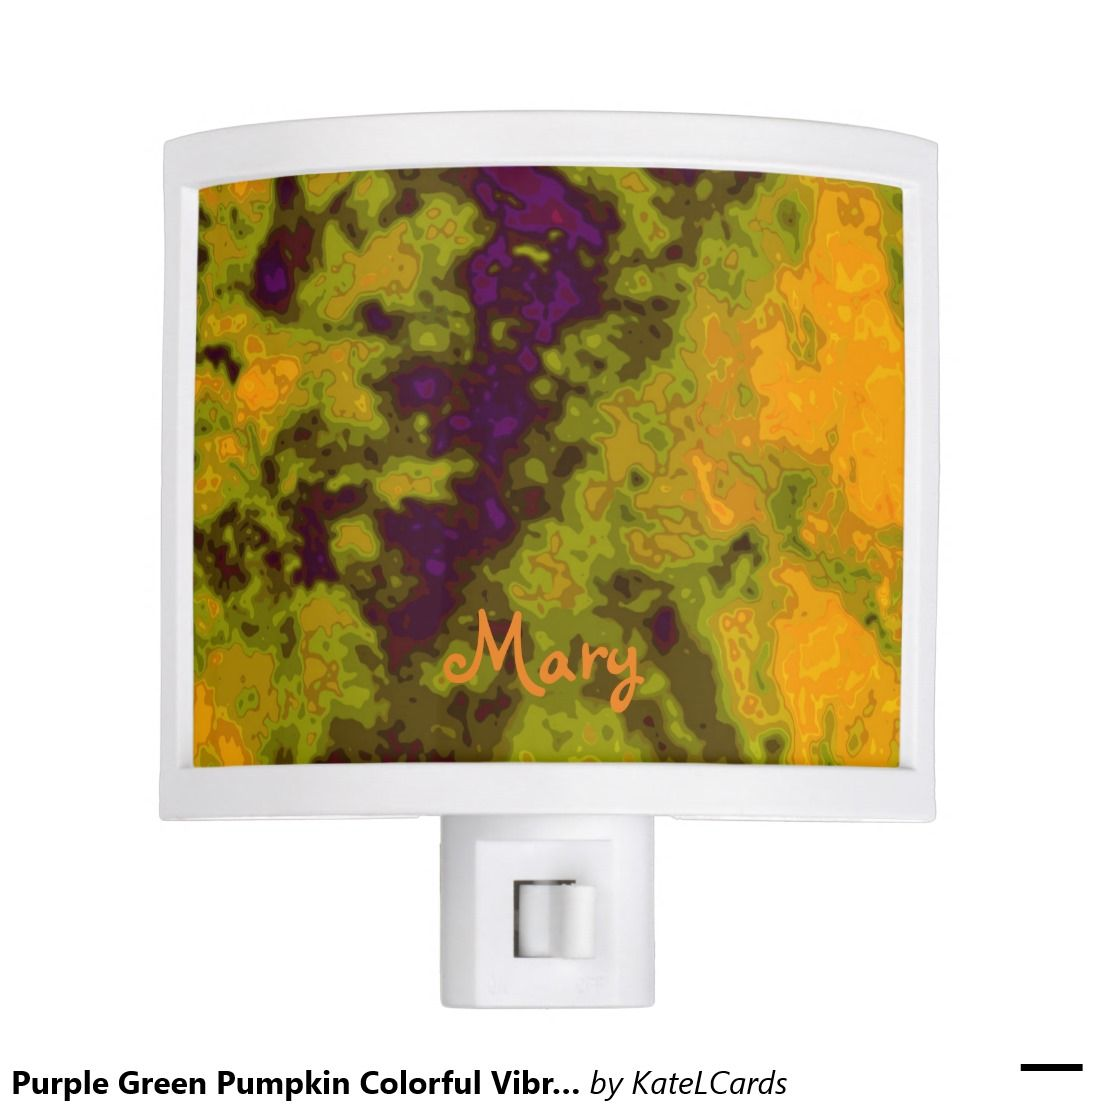 Purple Green Pumpkin Colorful Vibrant Night Lite